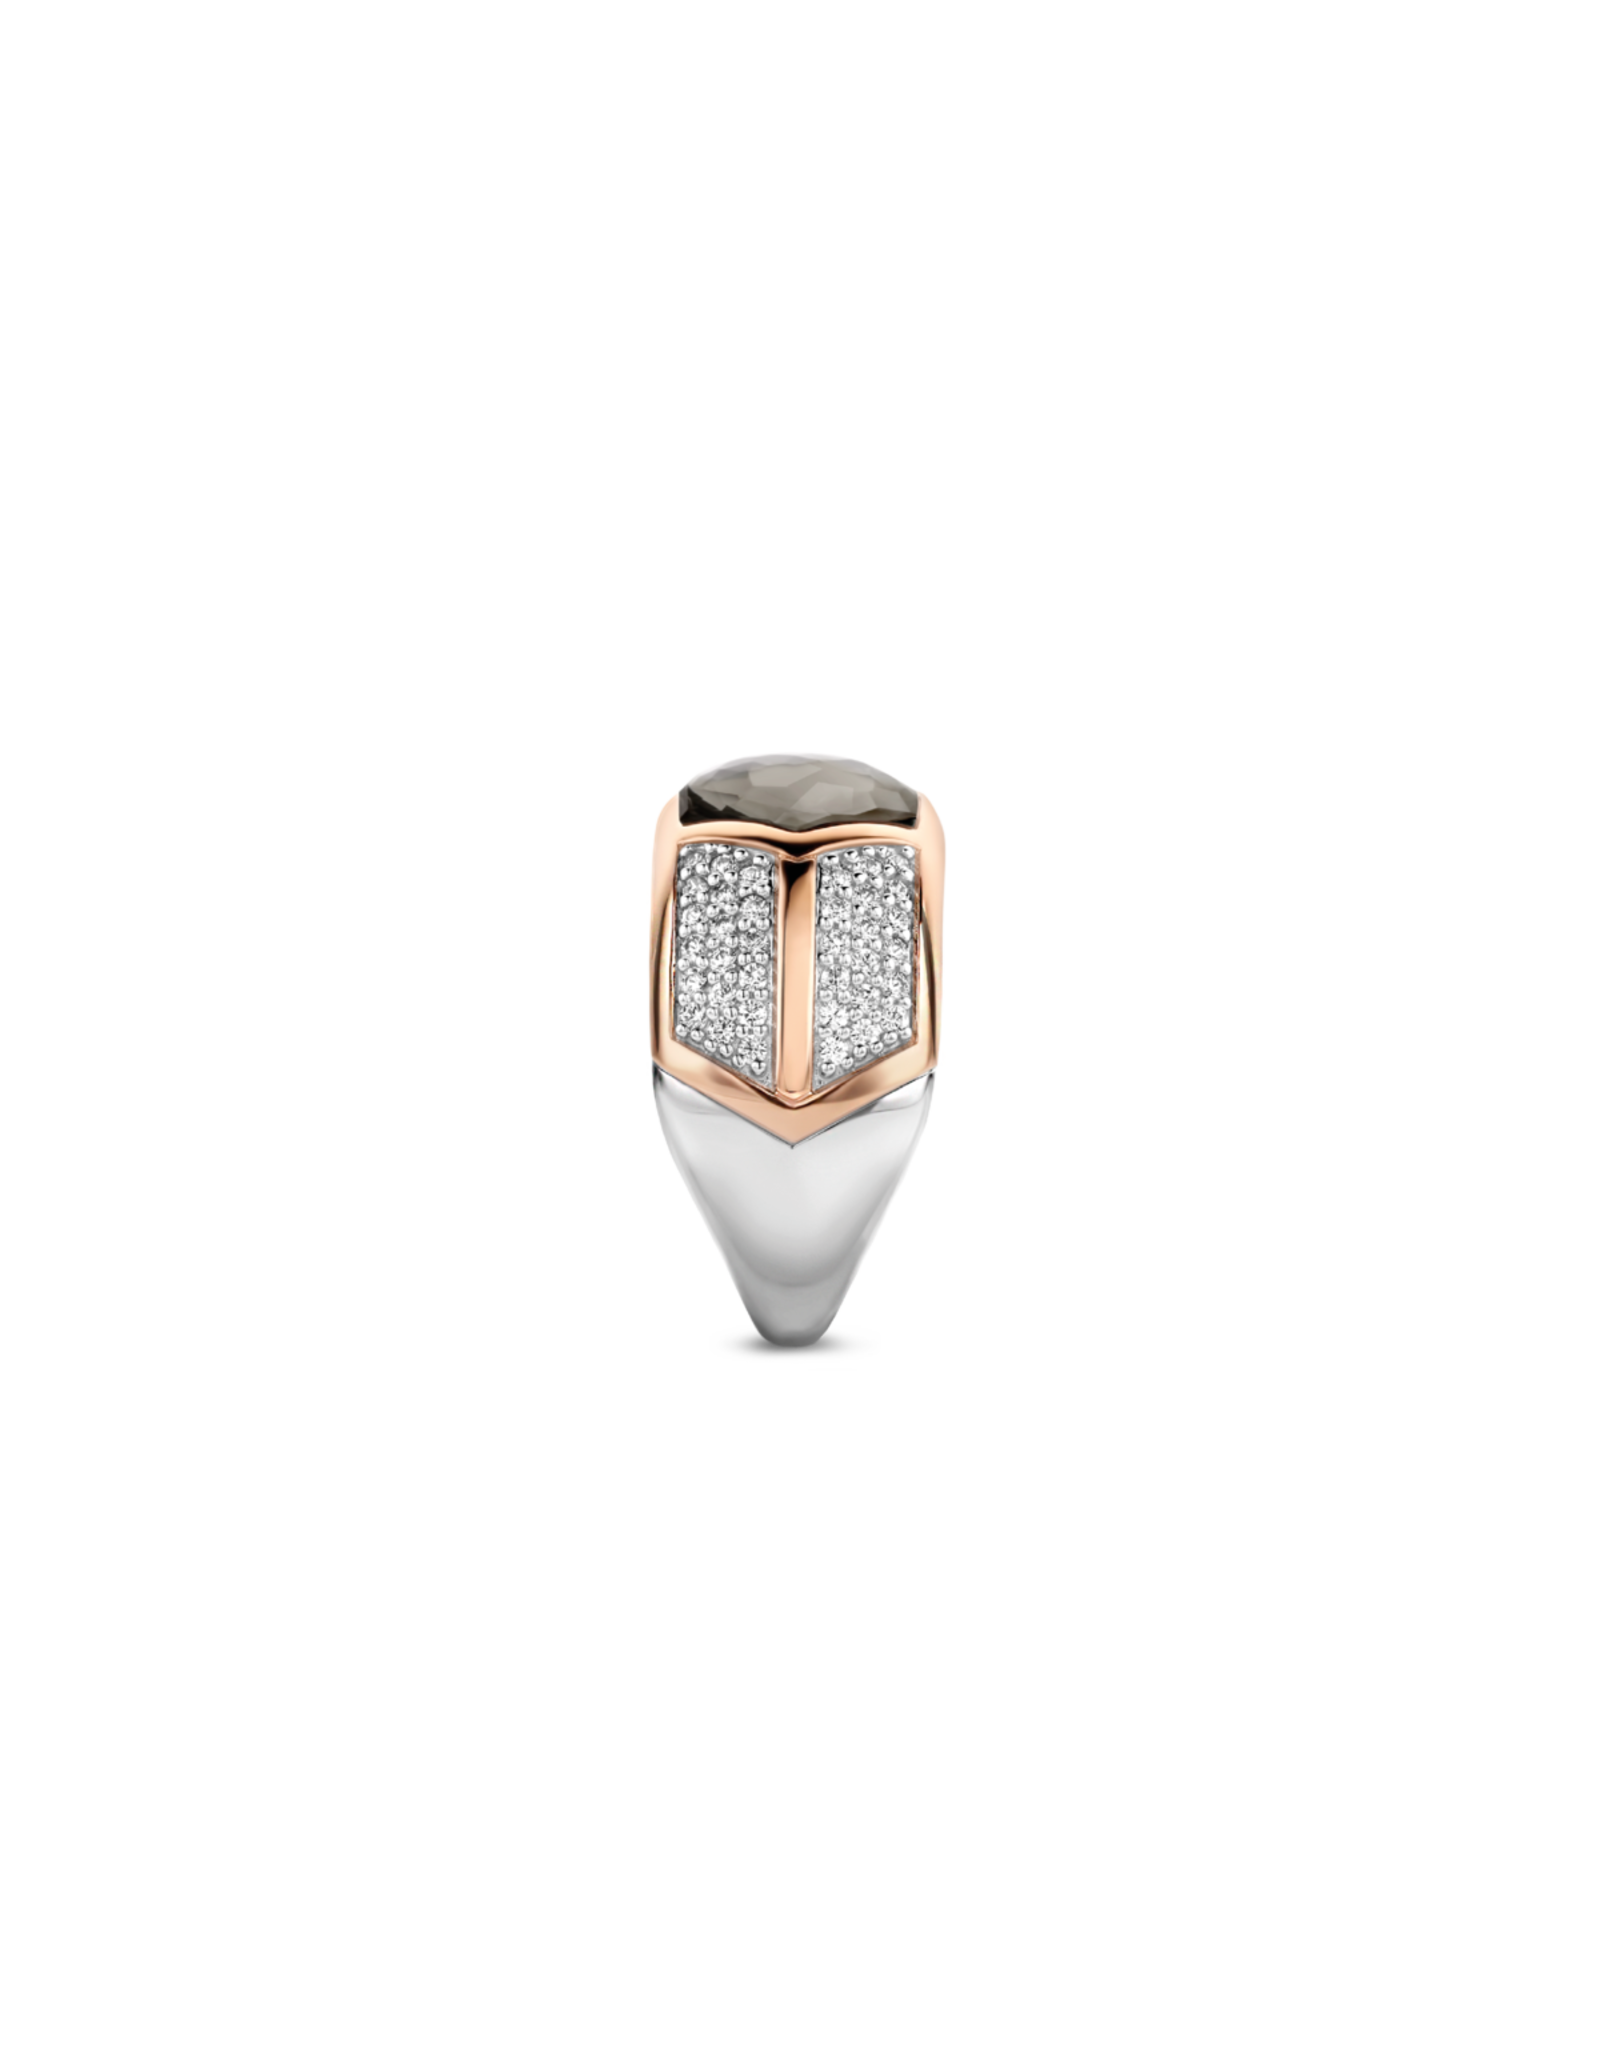 Art Deco Translucent Gray and Black Ring- 12204GB/56